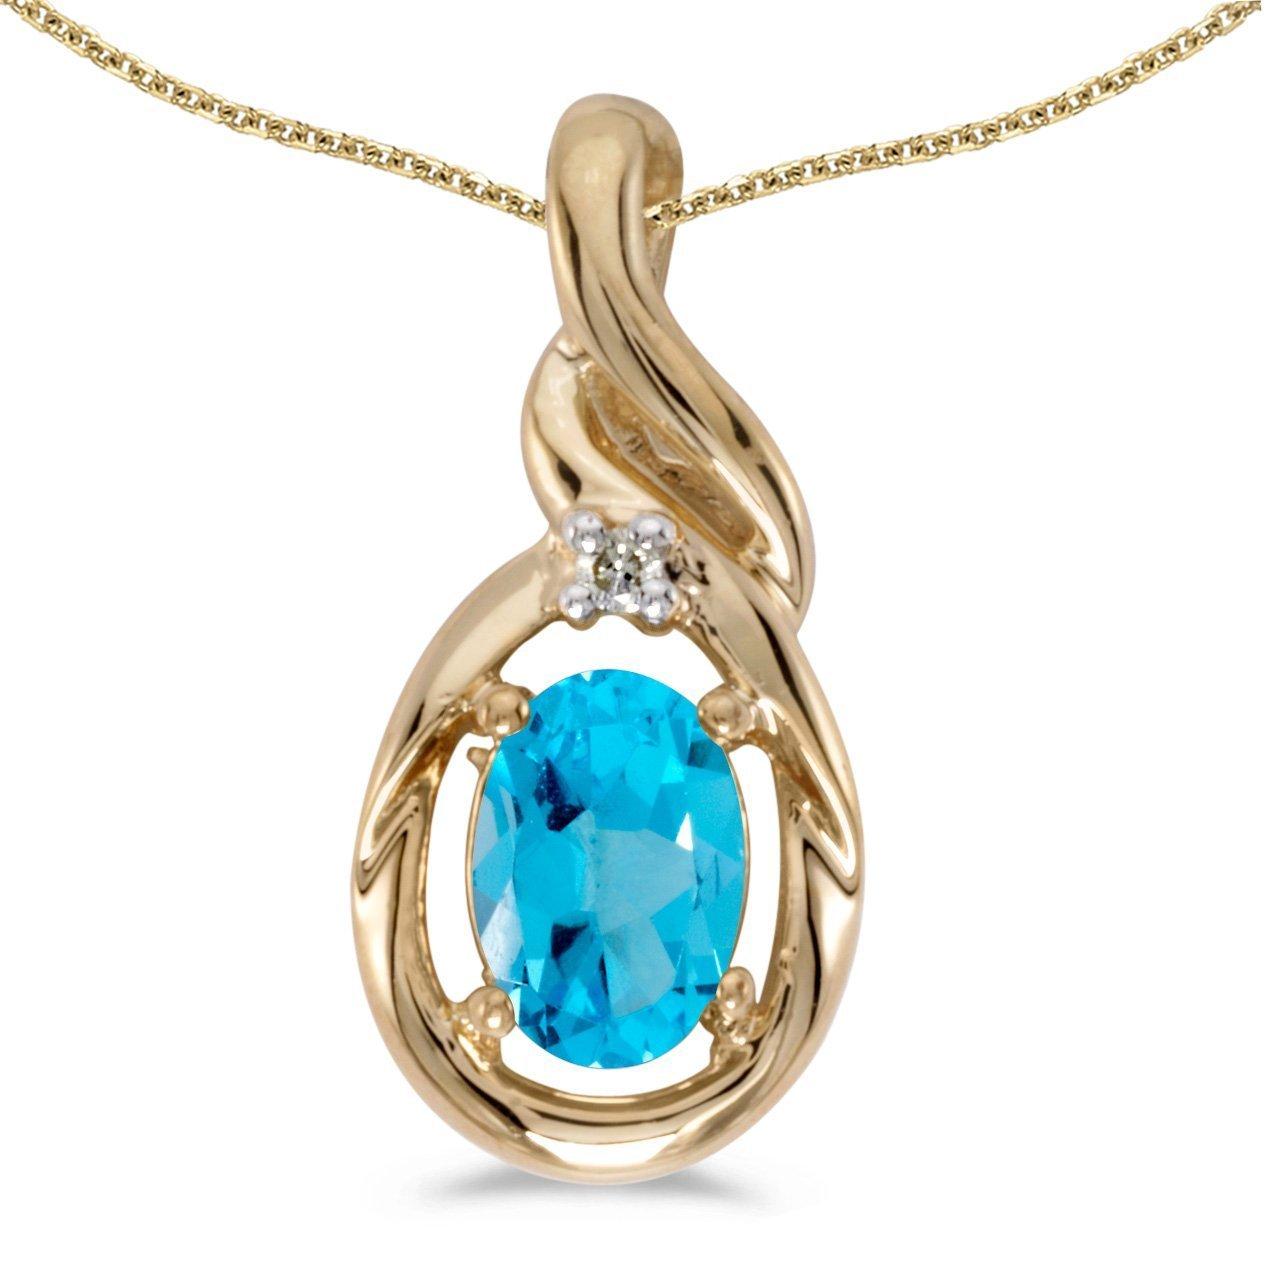 FB Jewels Solid 10k Yellow Gold Genuine Birthstone Oval Gemstone And Diamond Pendant 2//5 Cttw.